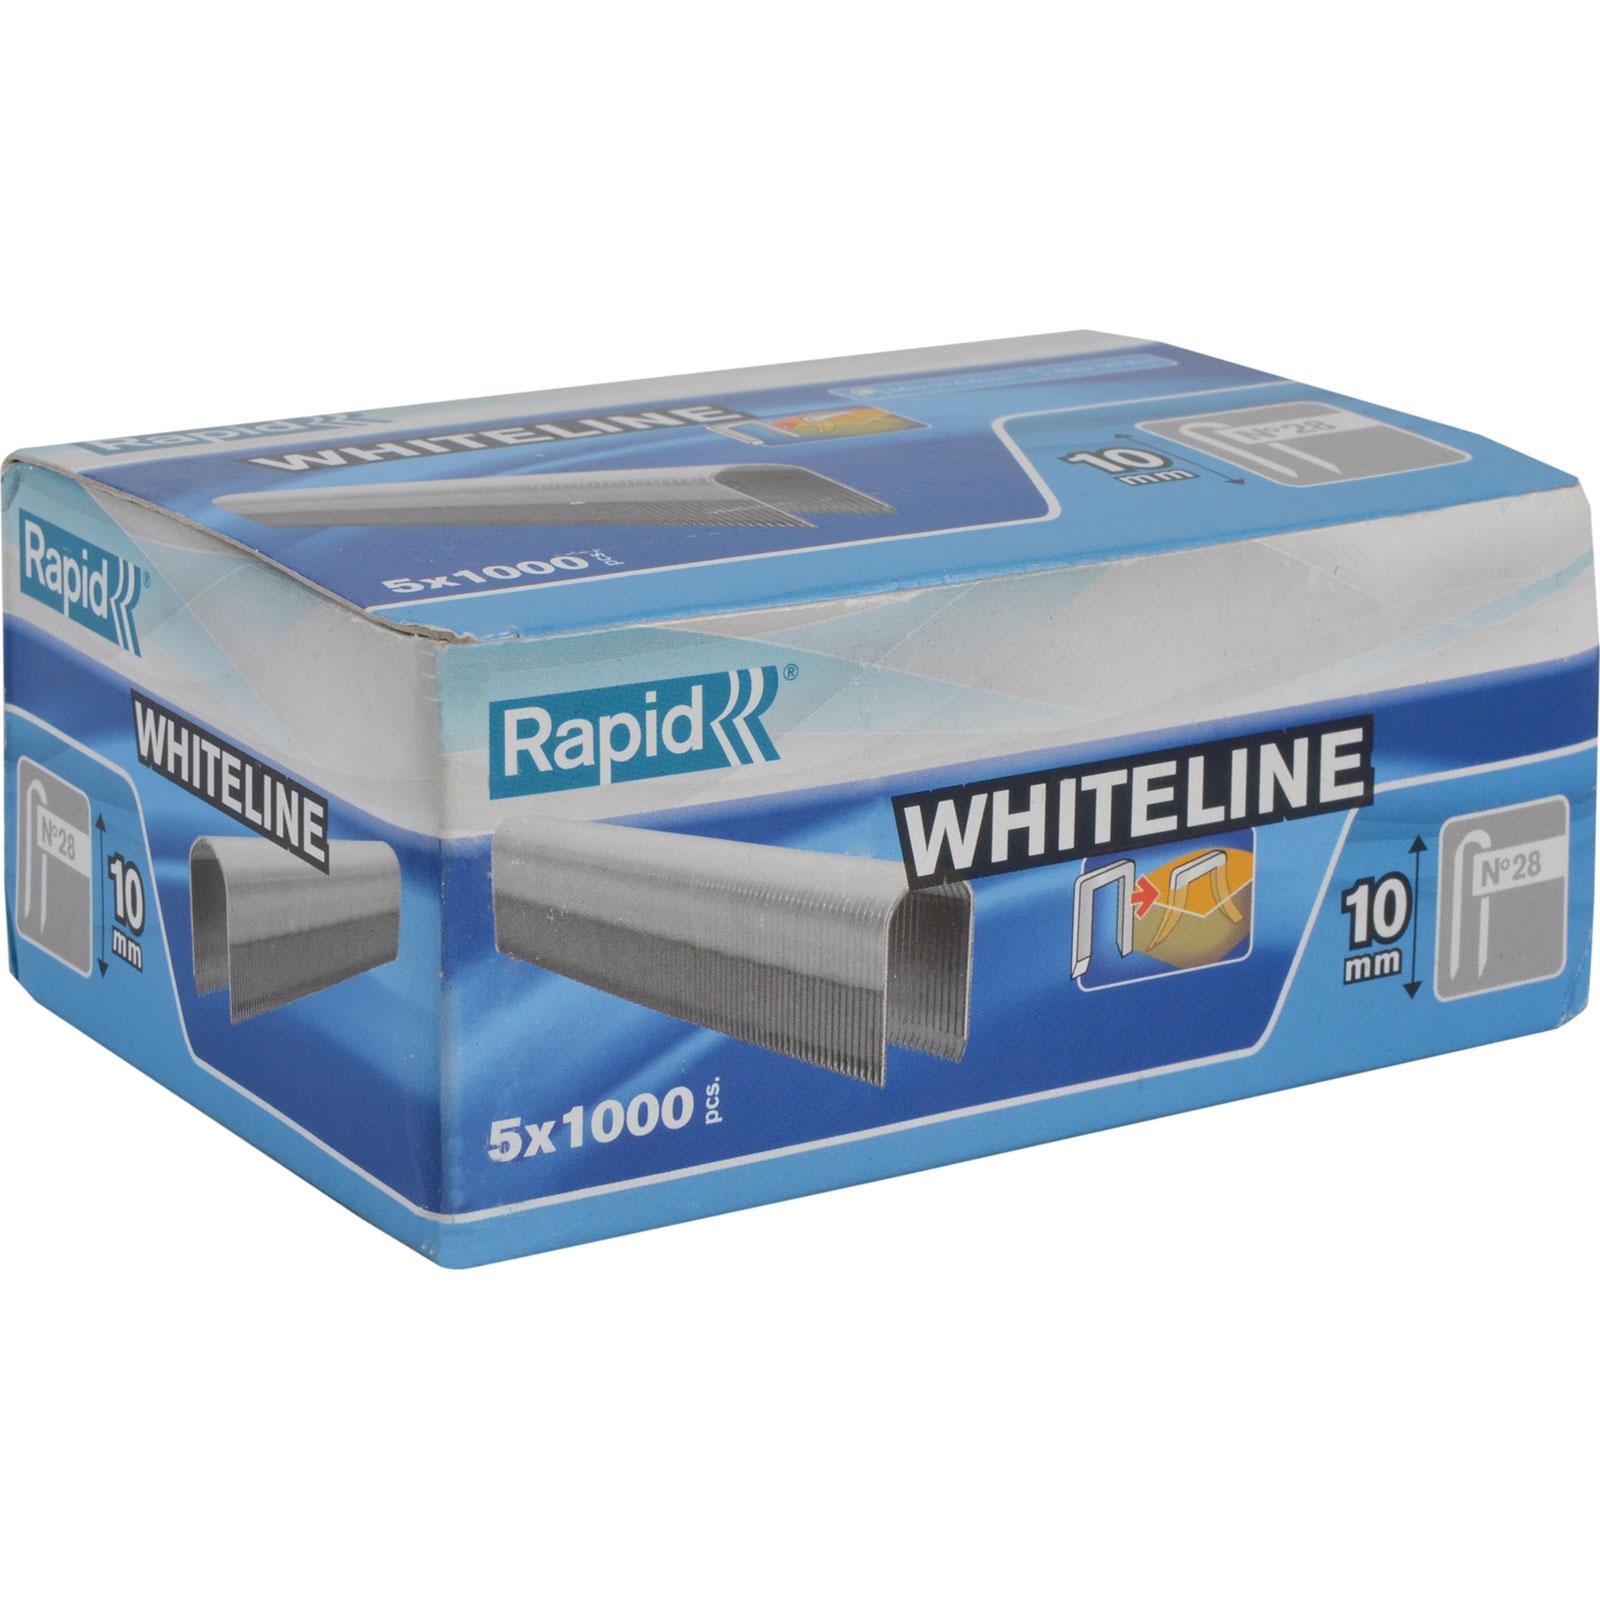 Cable staples No 28 10mm white 5x1000pcs carton box